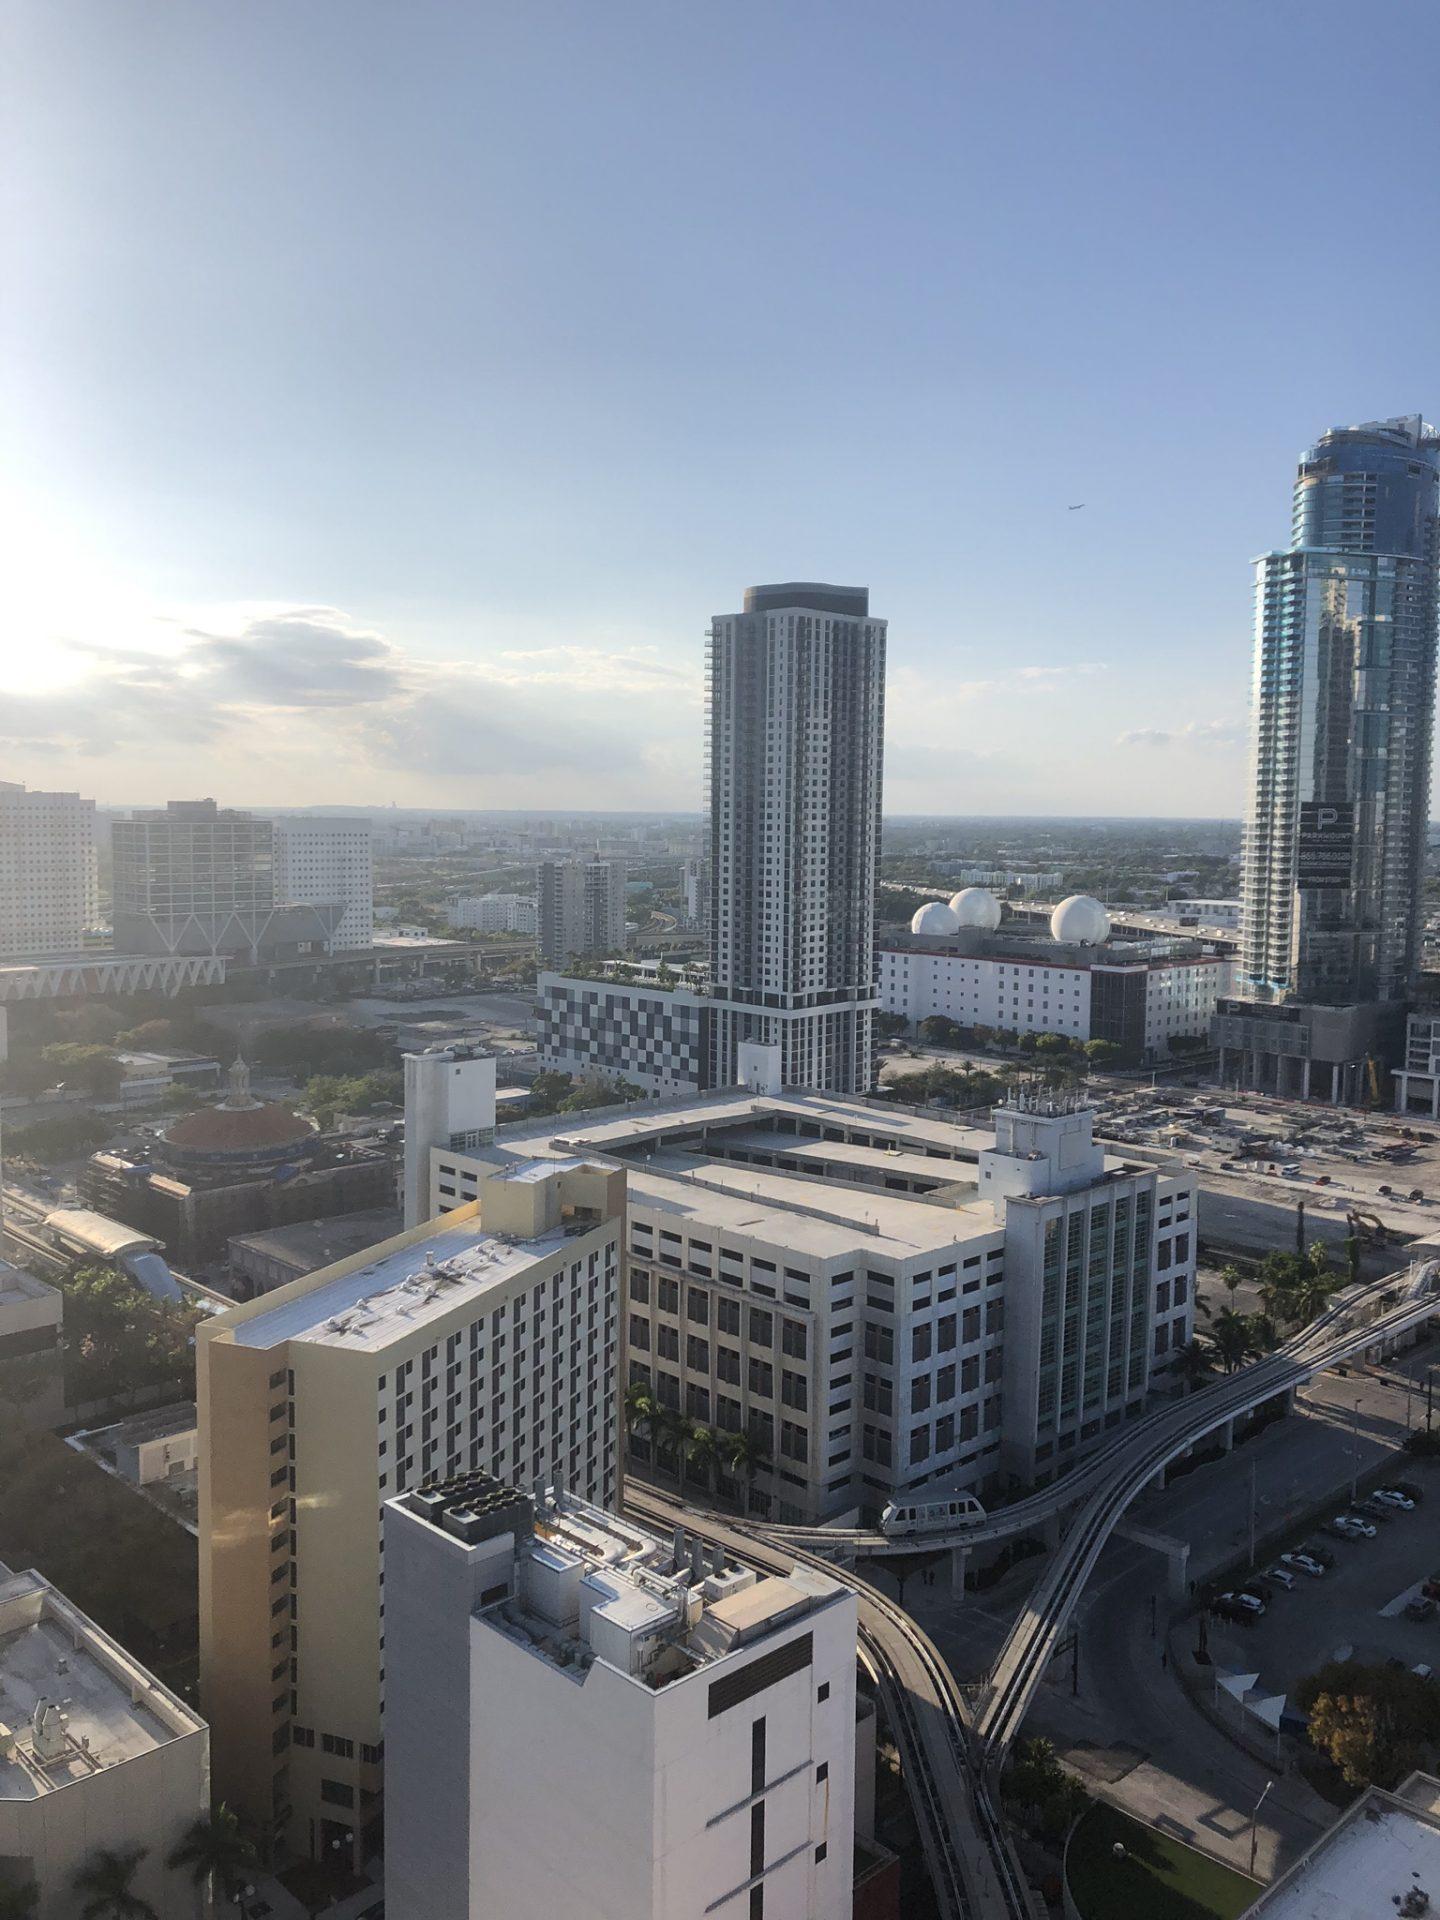 Views of Miami port